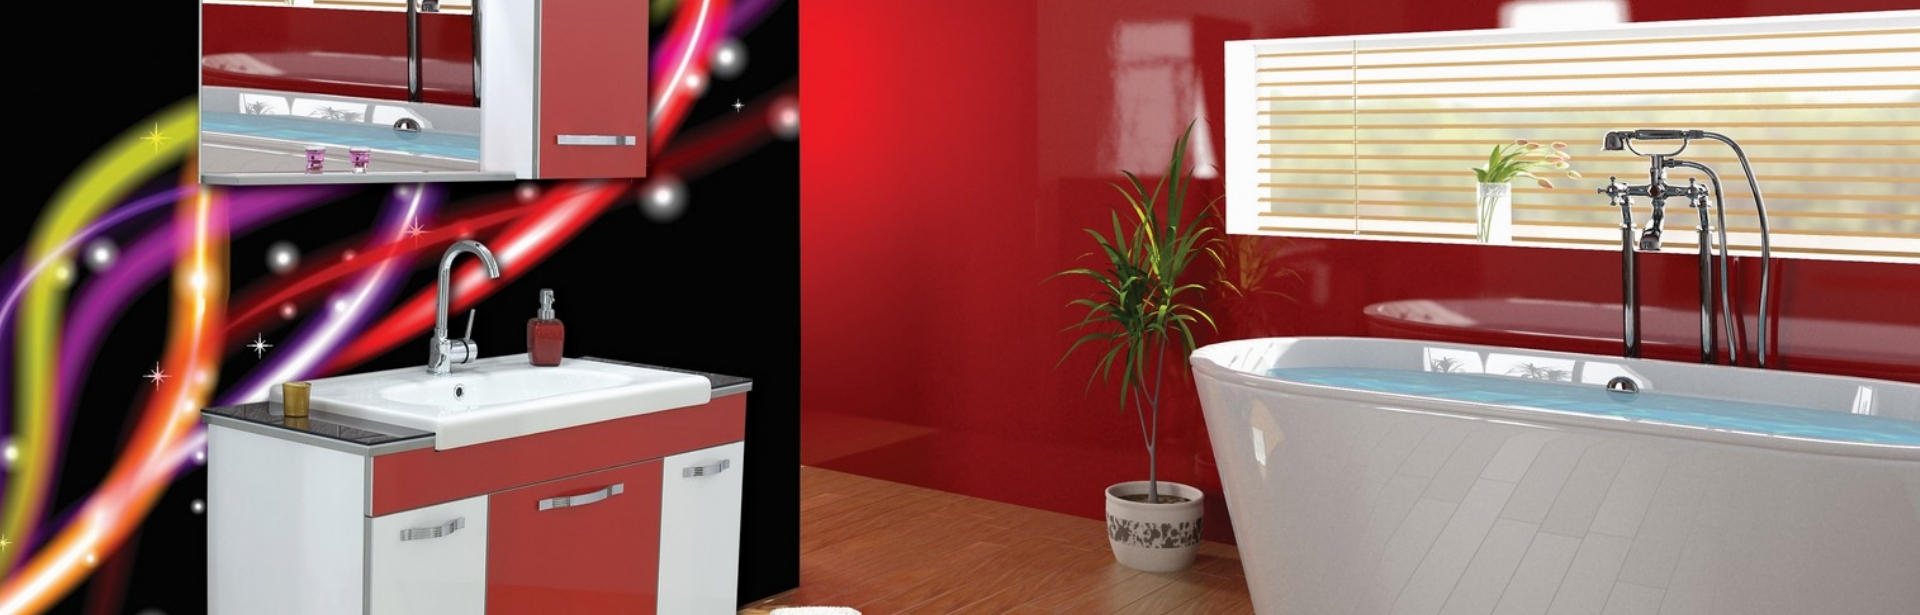 Banyo Dolapları Yako Banyo